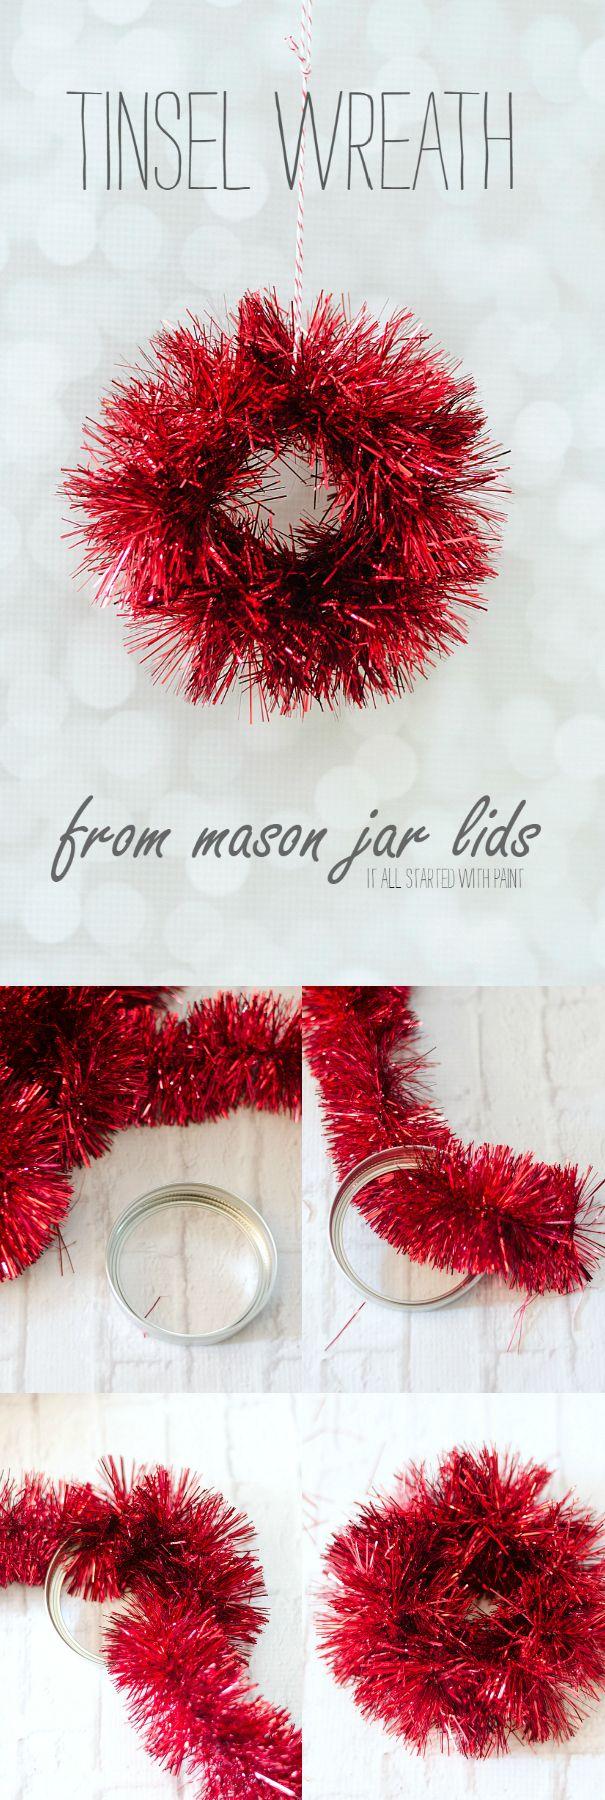 Graduation christmas ornament - Handmade Ornament Ideas